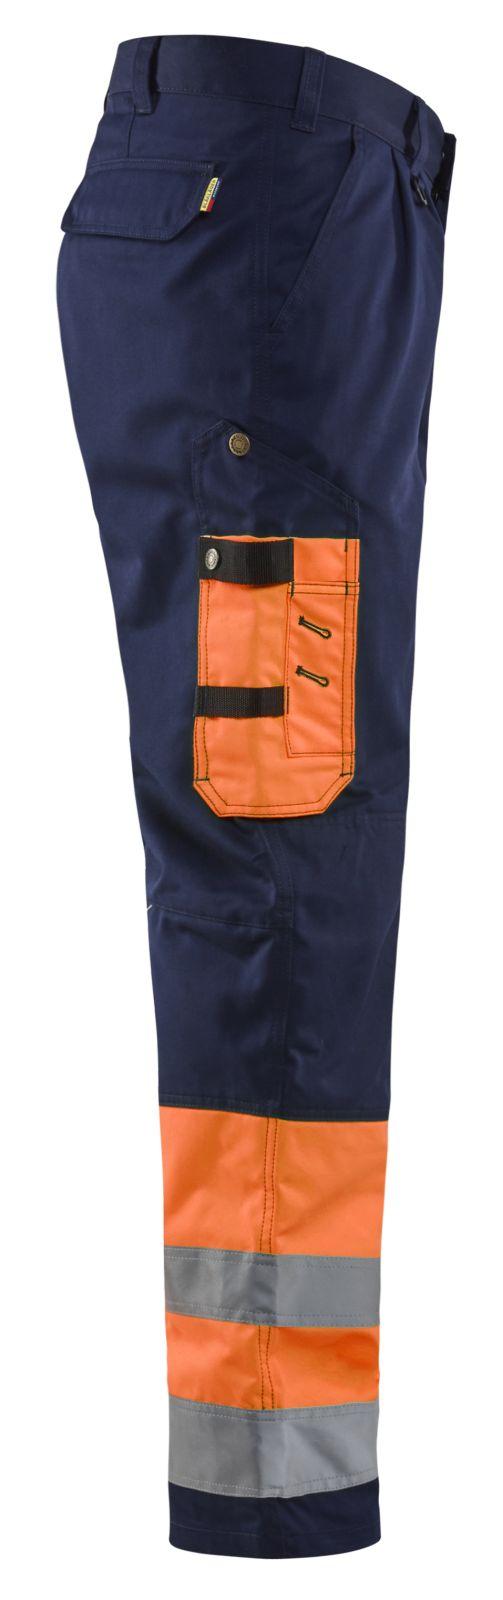 Blaklader Broeken 15841860 High Vis oranje-marineblauw(5389)